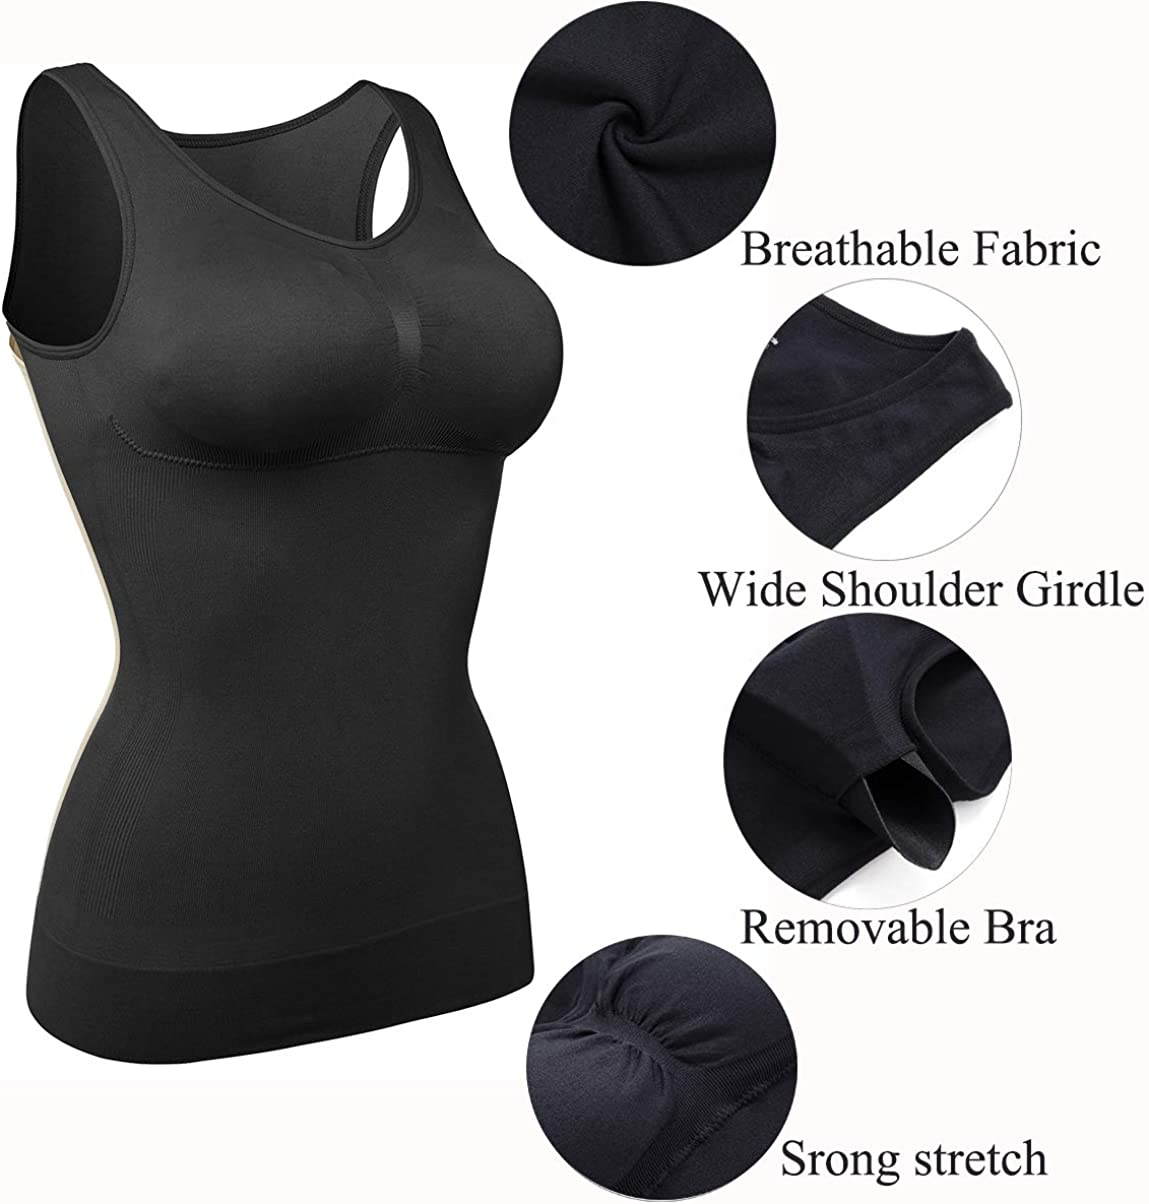 Stretchy Cami Bra Top  Medium Shapewear  Black Pullover Top Vintage Lingerie